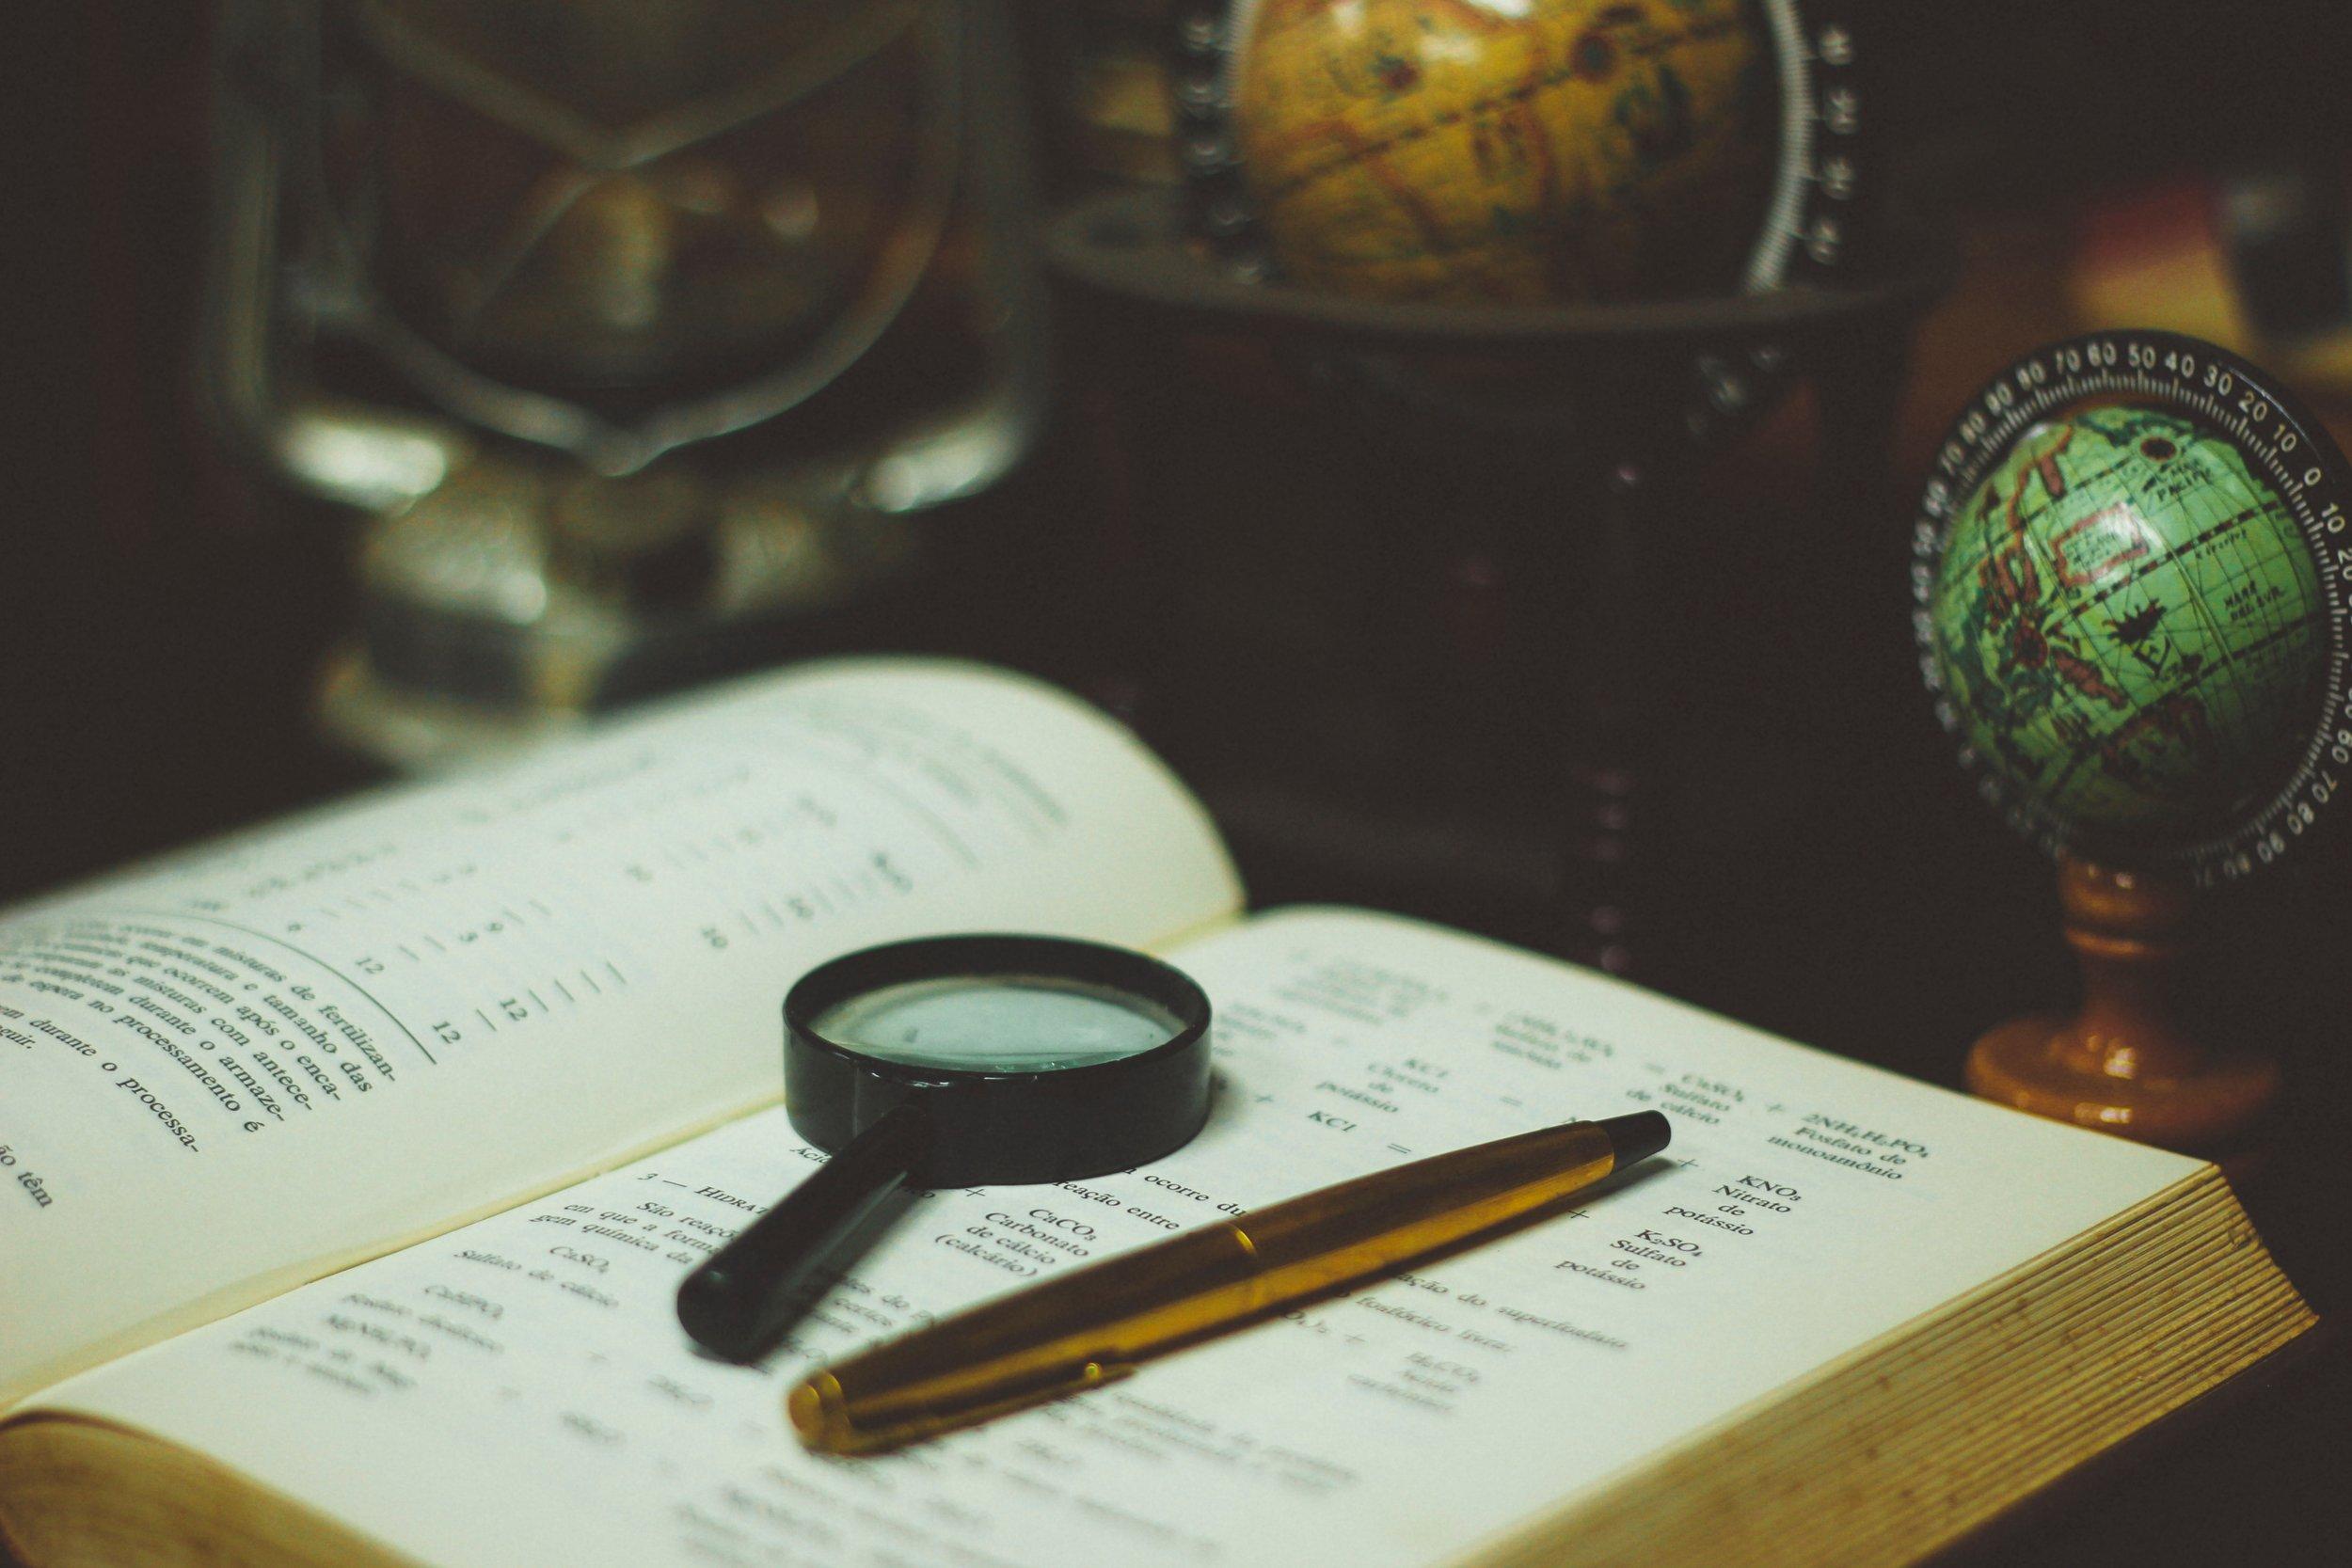 unsplash-book-magnifyingglass.jpg